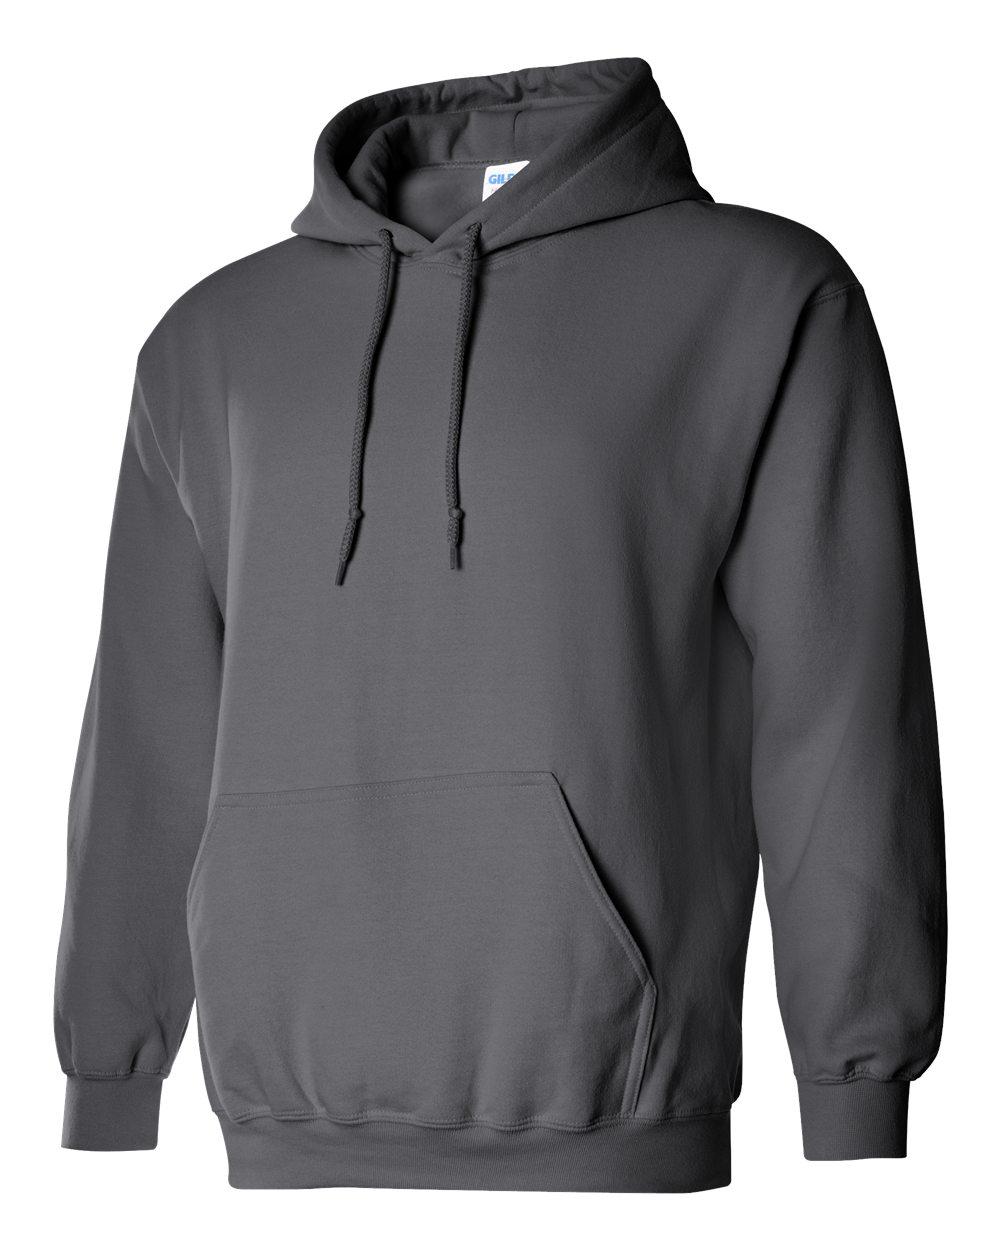 Gildan Heavy Blend Hooded Sweatshirt GI18500 Charcoal